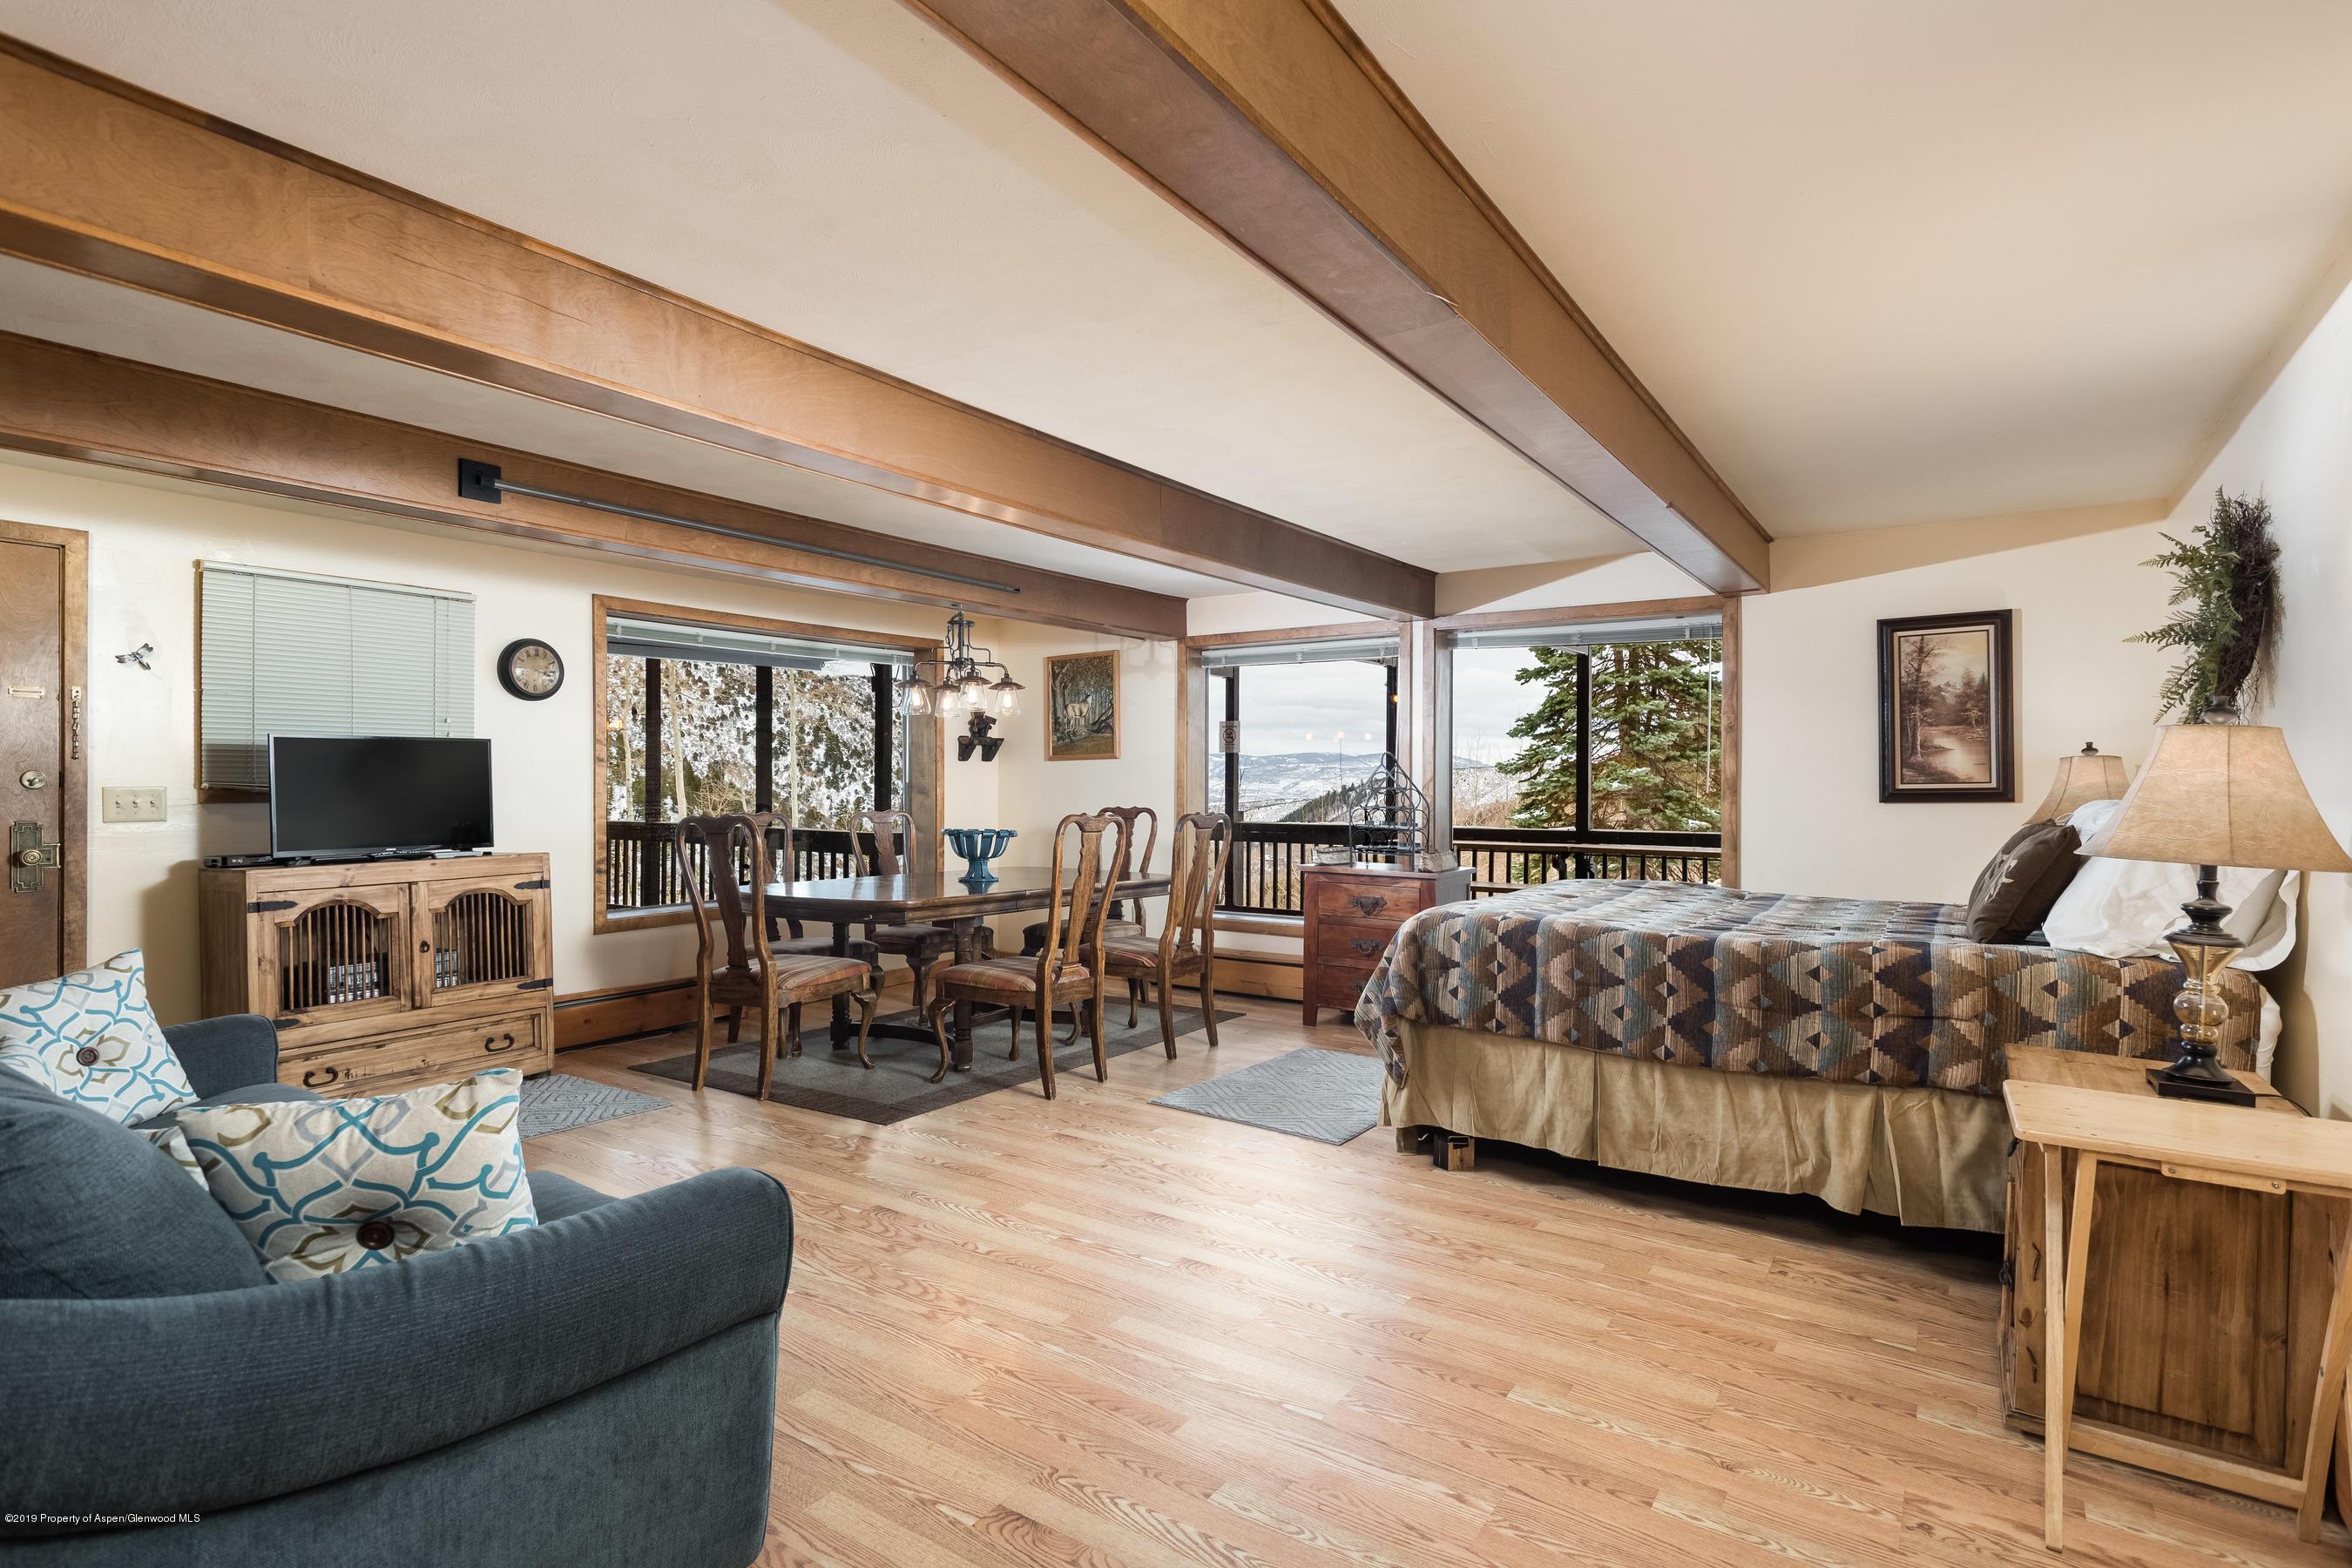 11101 Co Rd 117, D1 - Glenwood Springs, Colorado